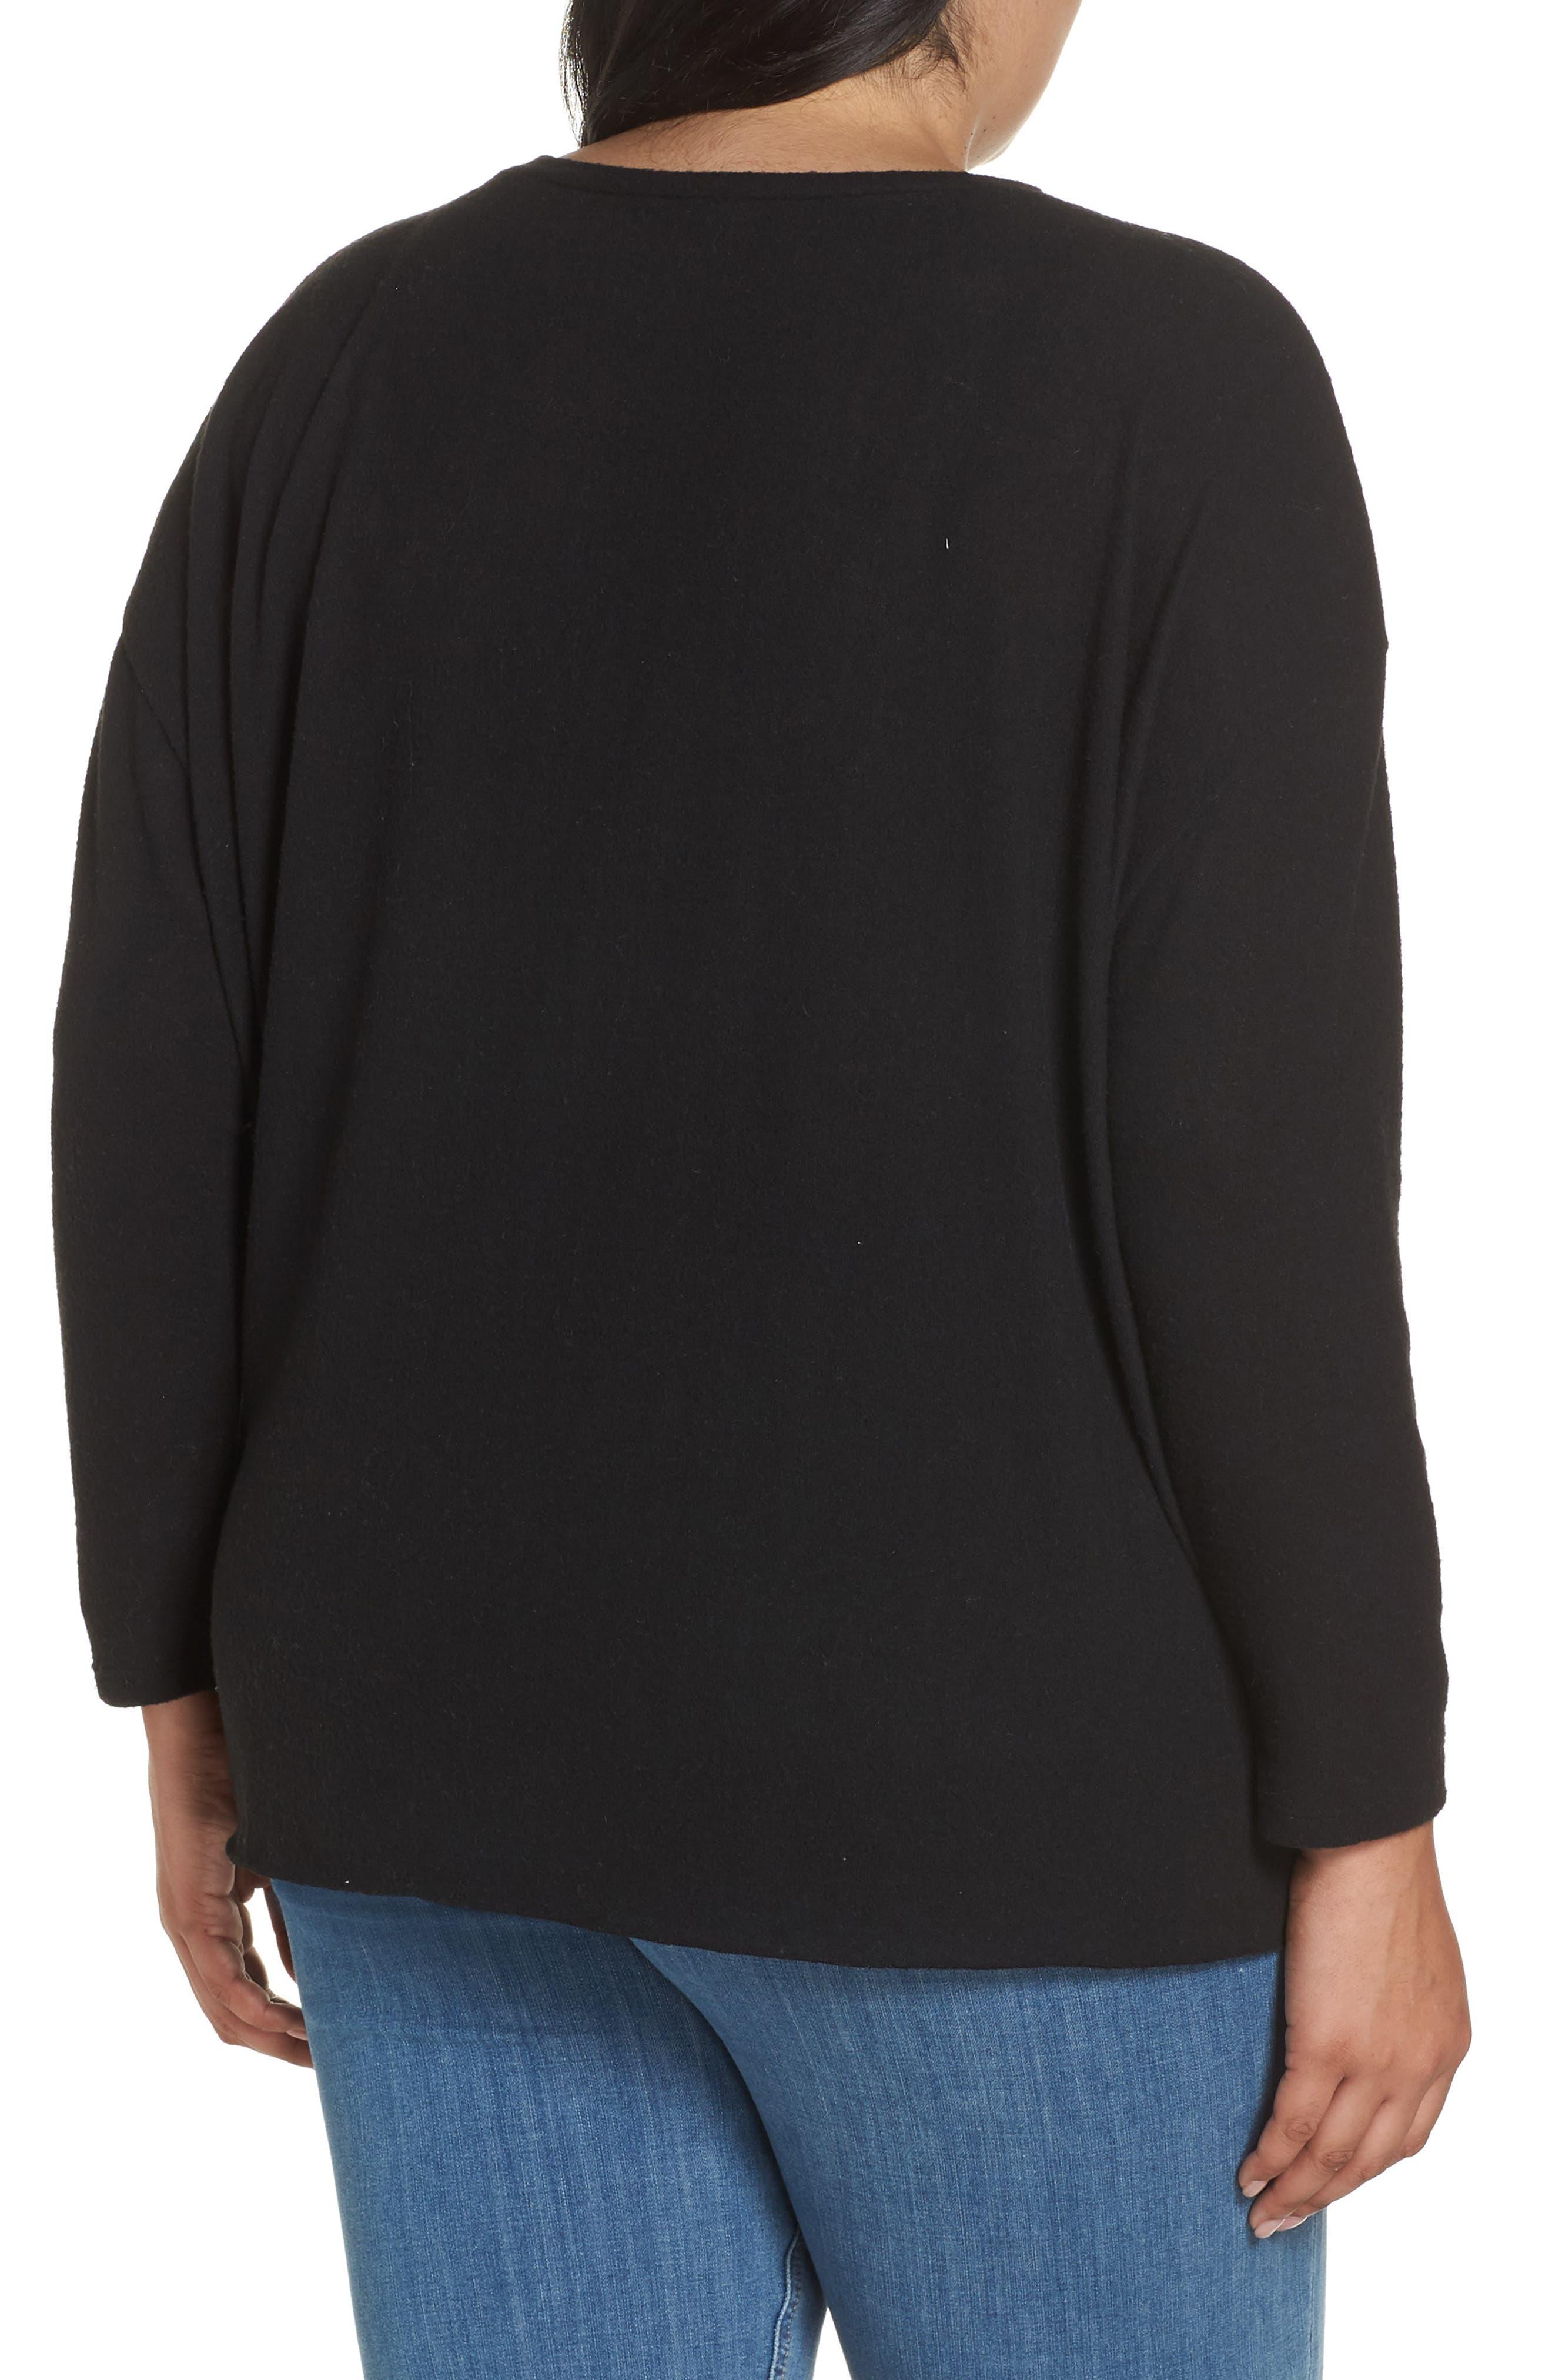 Fuzzy Tie Front Sweatshirt,                             Alternate thumbnail 2, color,                             BLACK